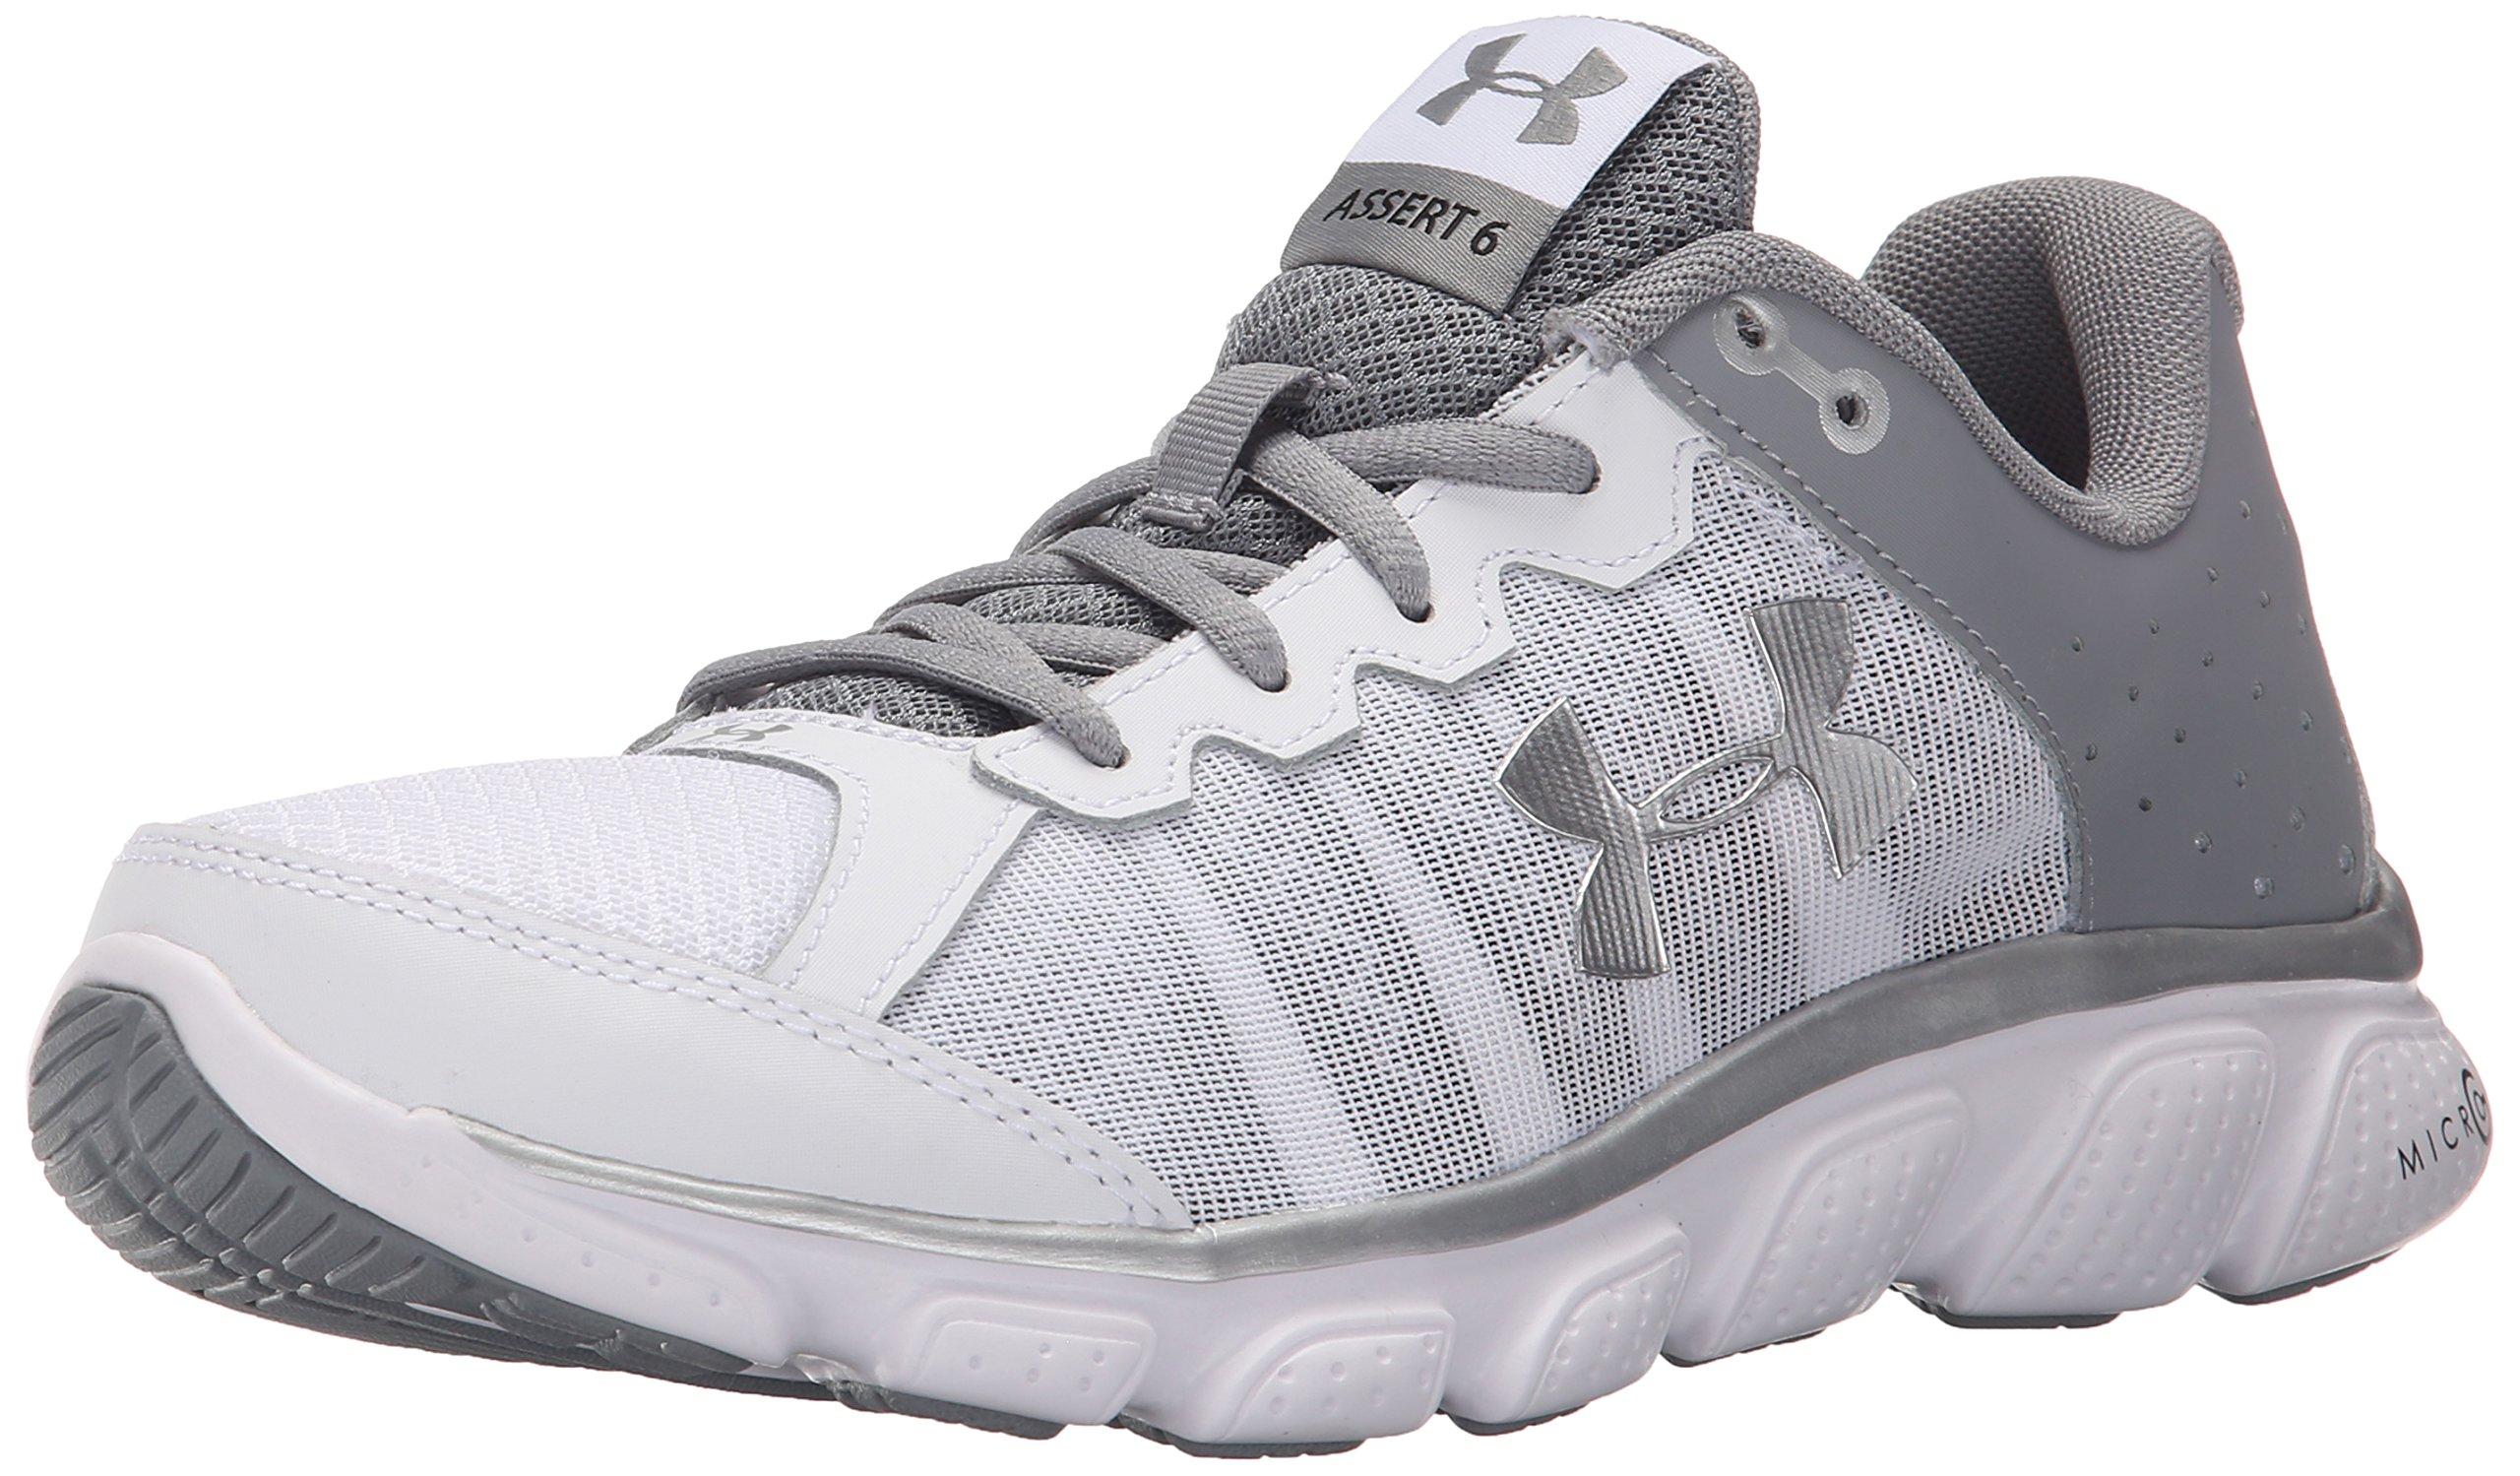 Under Armour Women's Micro G Assert 6 Running Shoe, White (100)/Steel, 6.5 by Under Armour